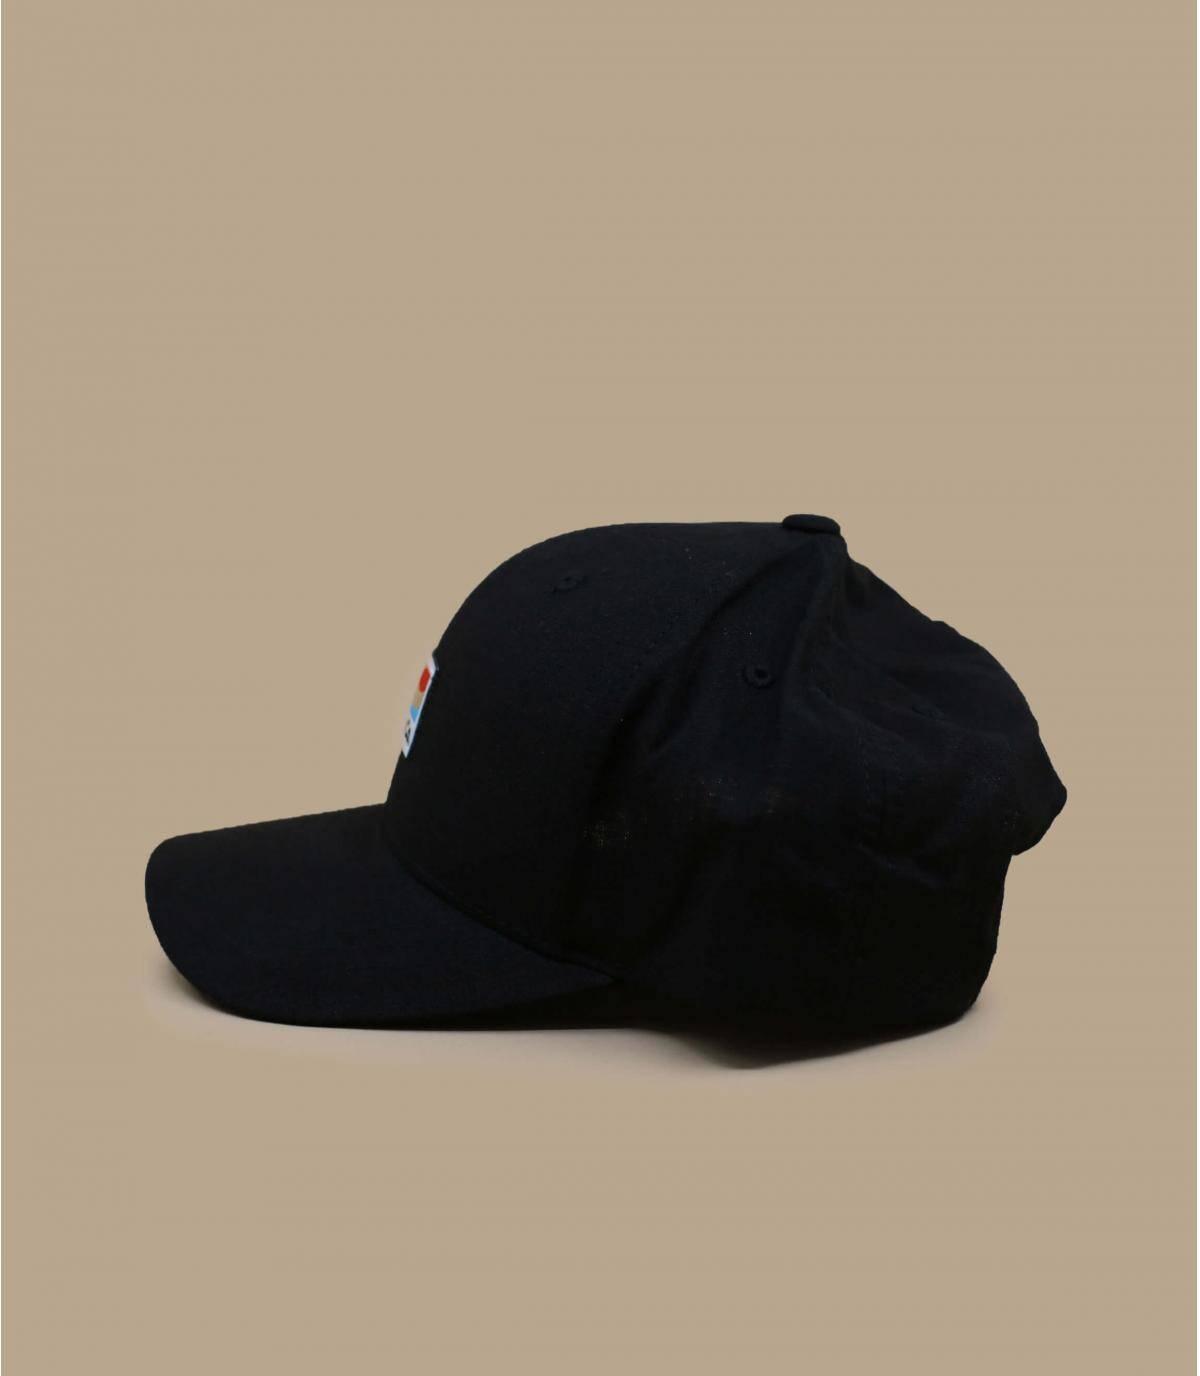 Dettagli New Wave black - image 3